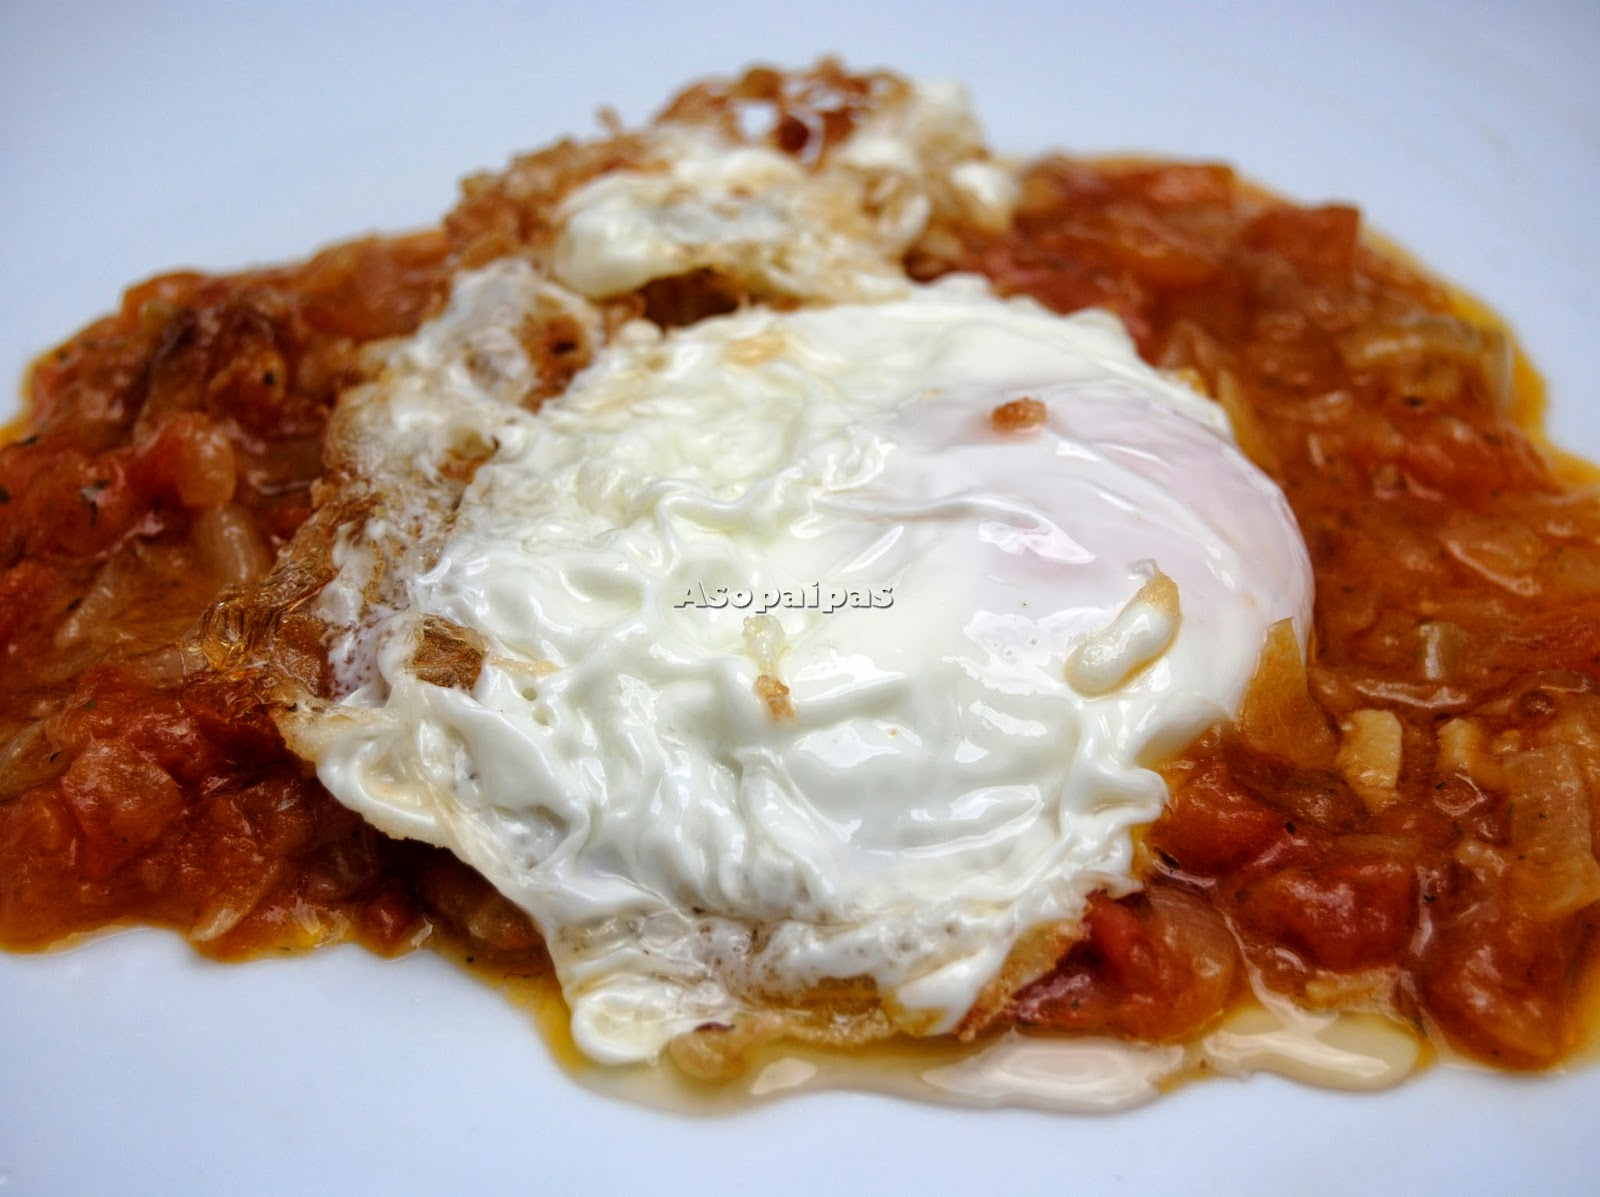 Huevos Fritos con Sofrito de Verduras de las Islas Baleares.